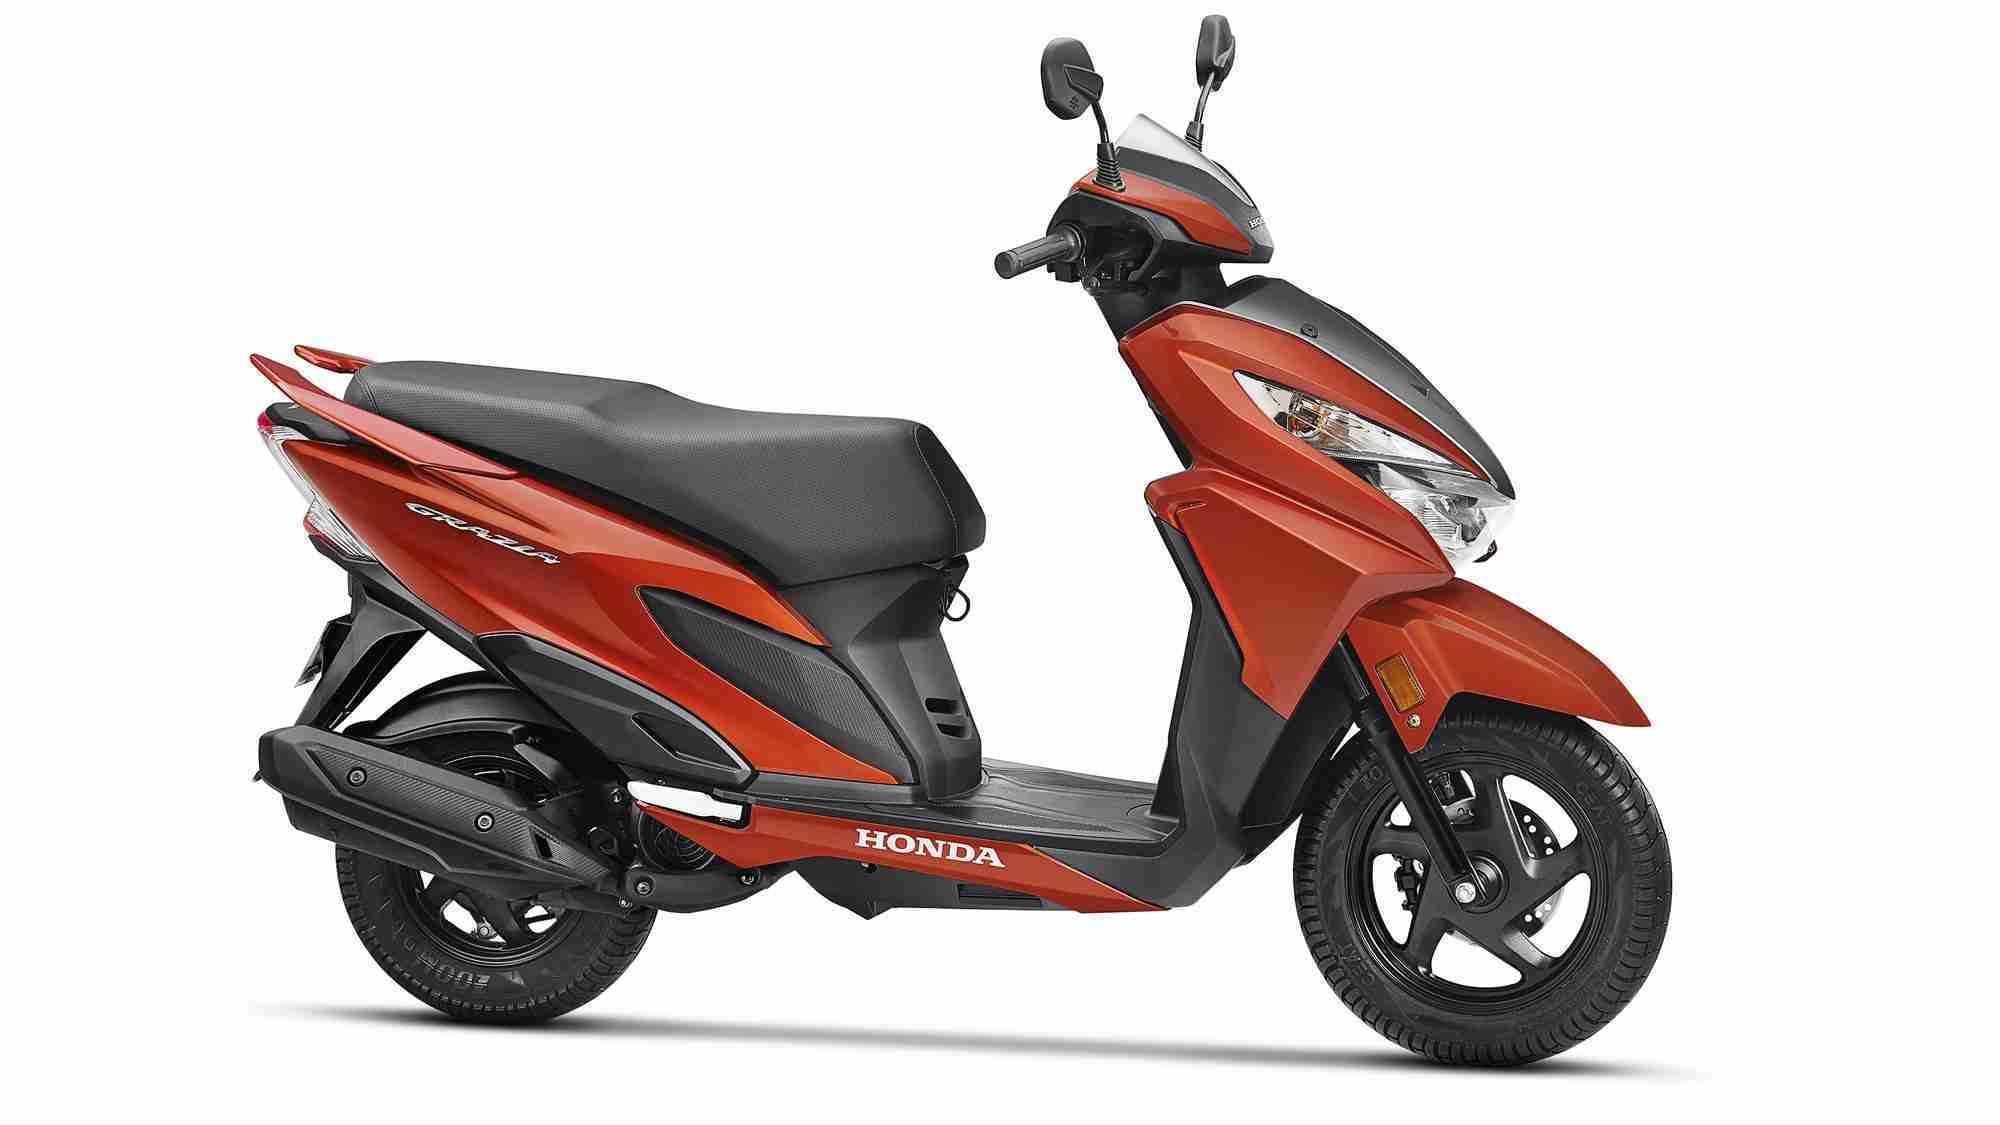 Honda Grazia scooter image